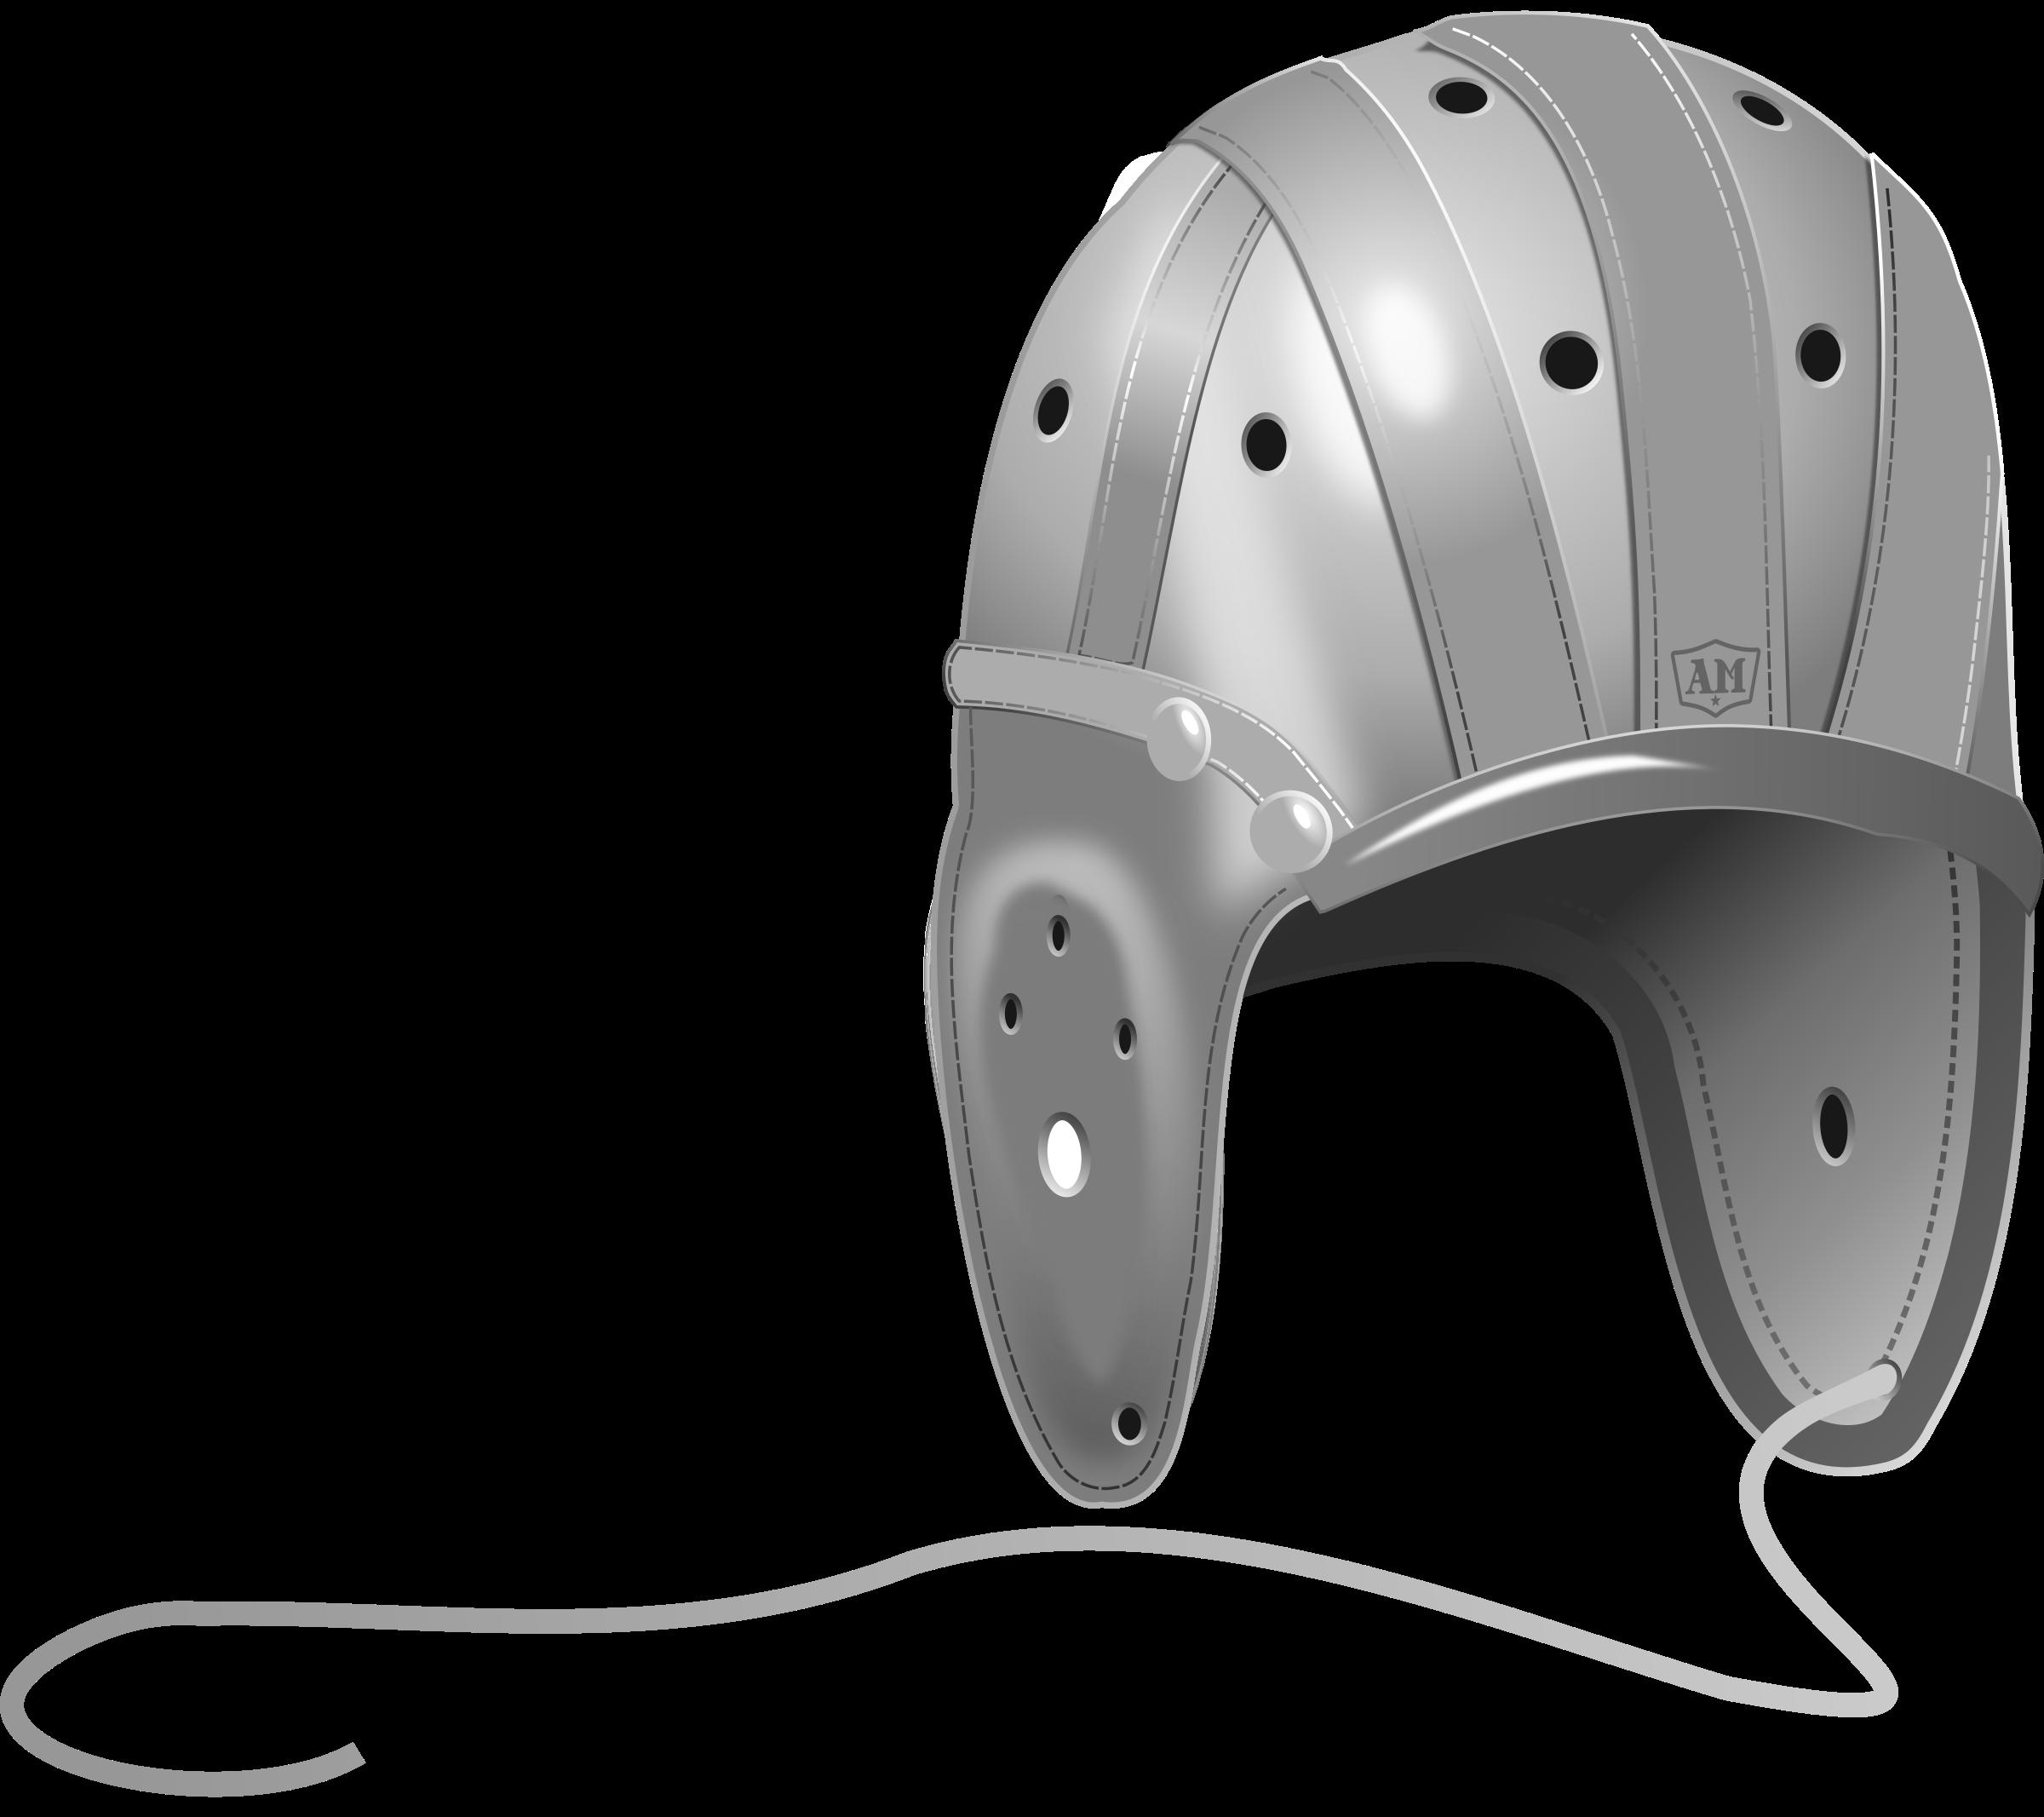 Black football helmet clipart image download Clipart - 1940's Leather Football Helmet image download